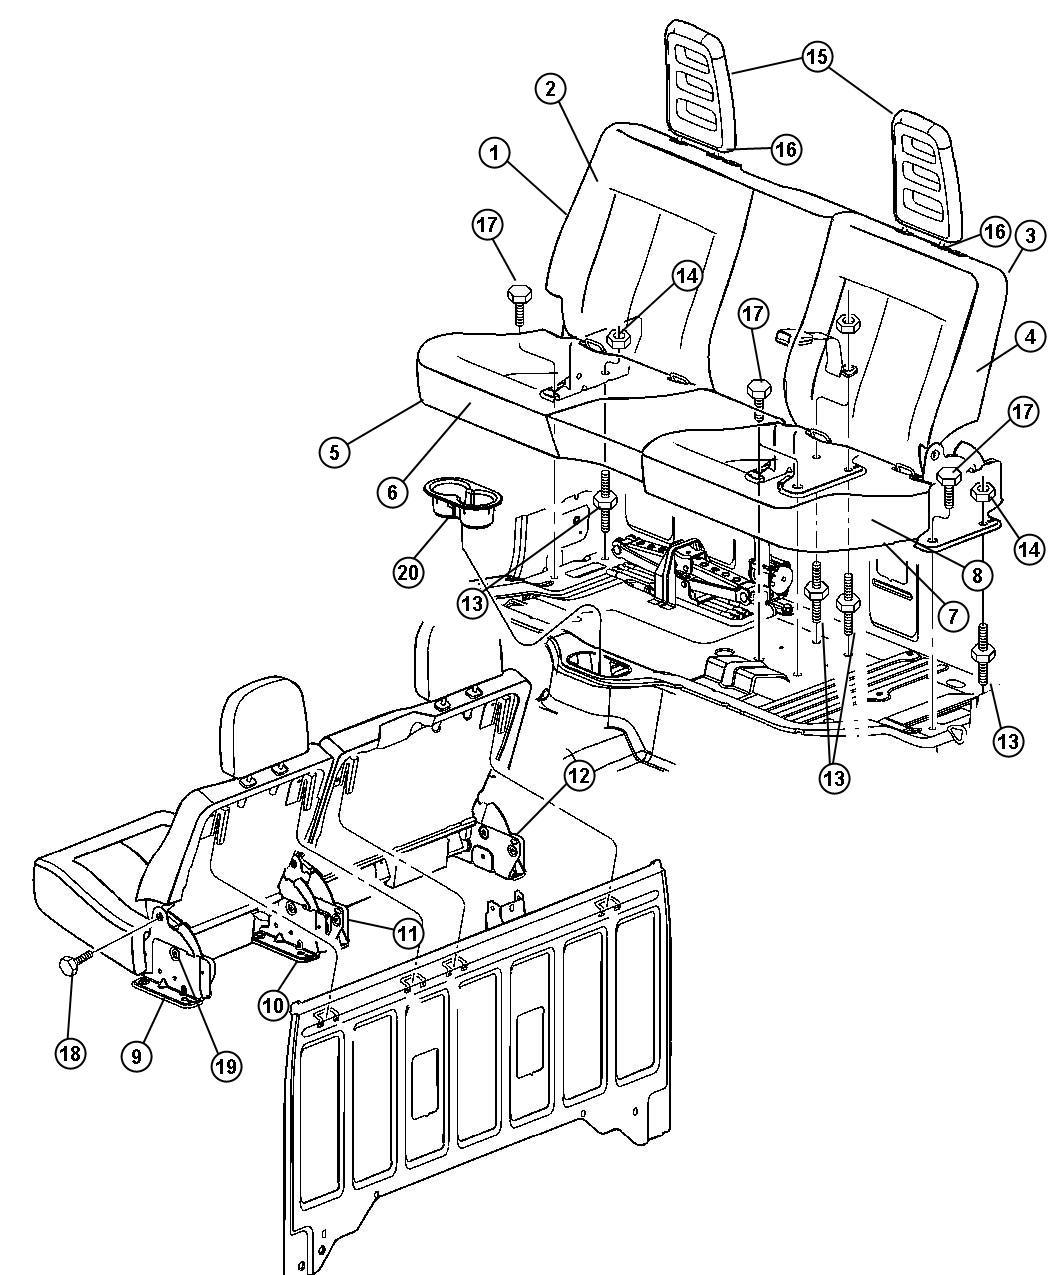 Dodge Dakota Cover. Rear seat cushion. [dd], [dd], [power